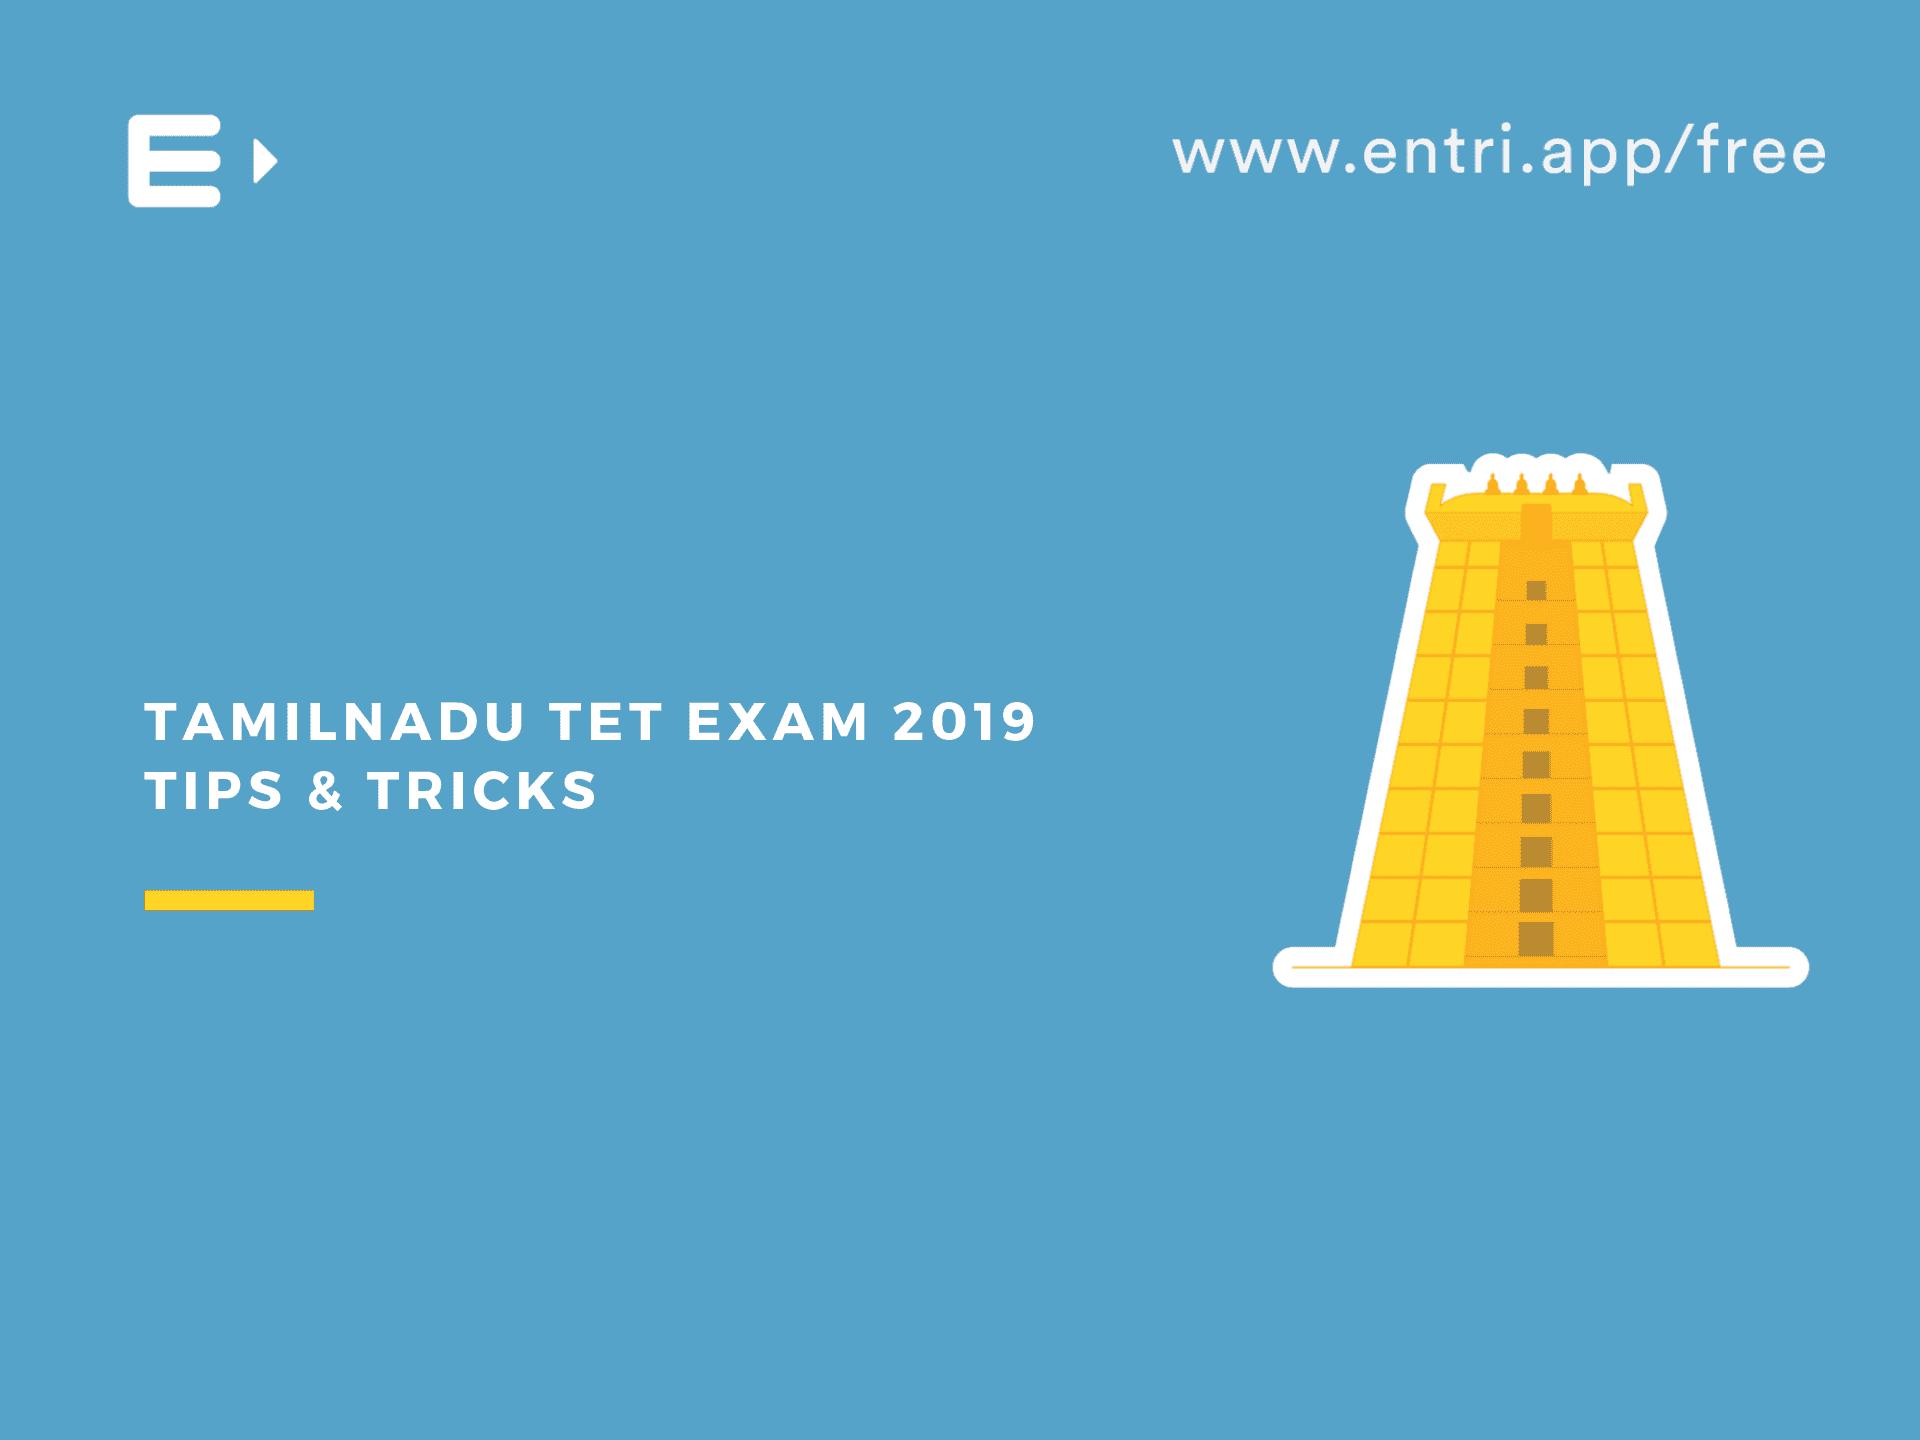 Tamil Nadu TET Exam 2019 Tricks and Tips - Entri Blog